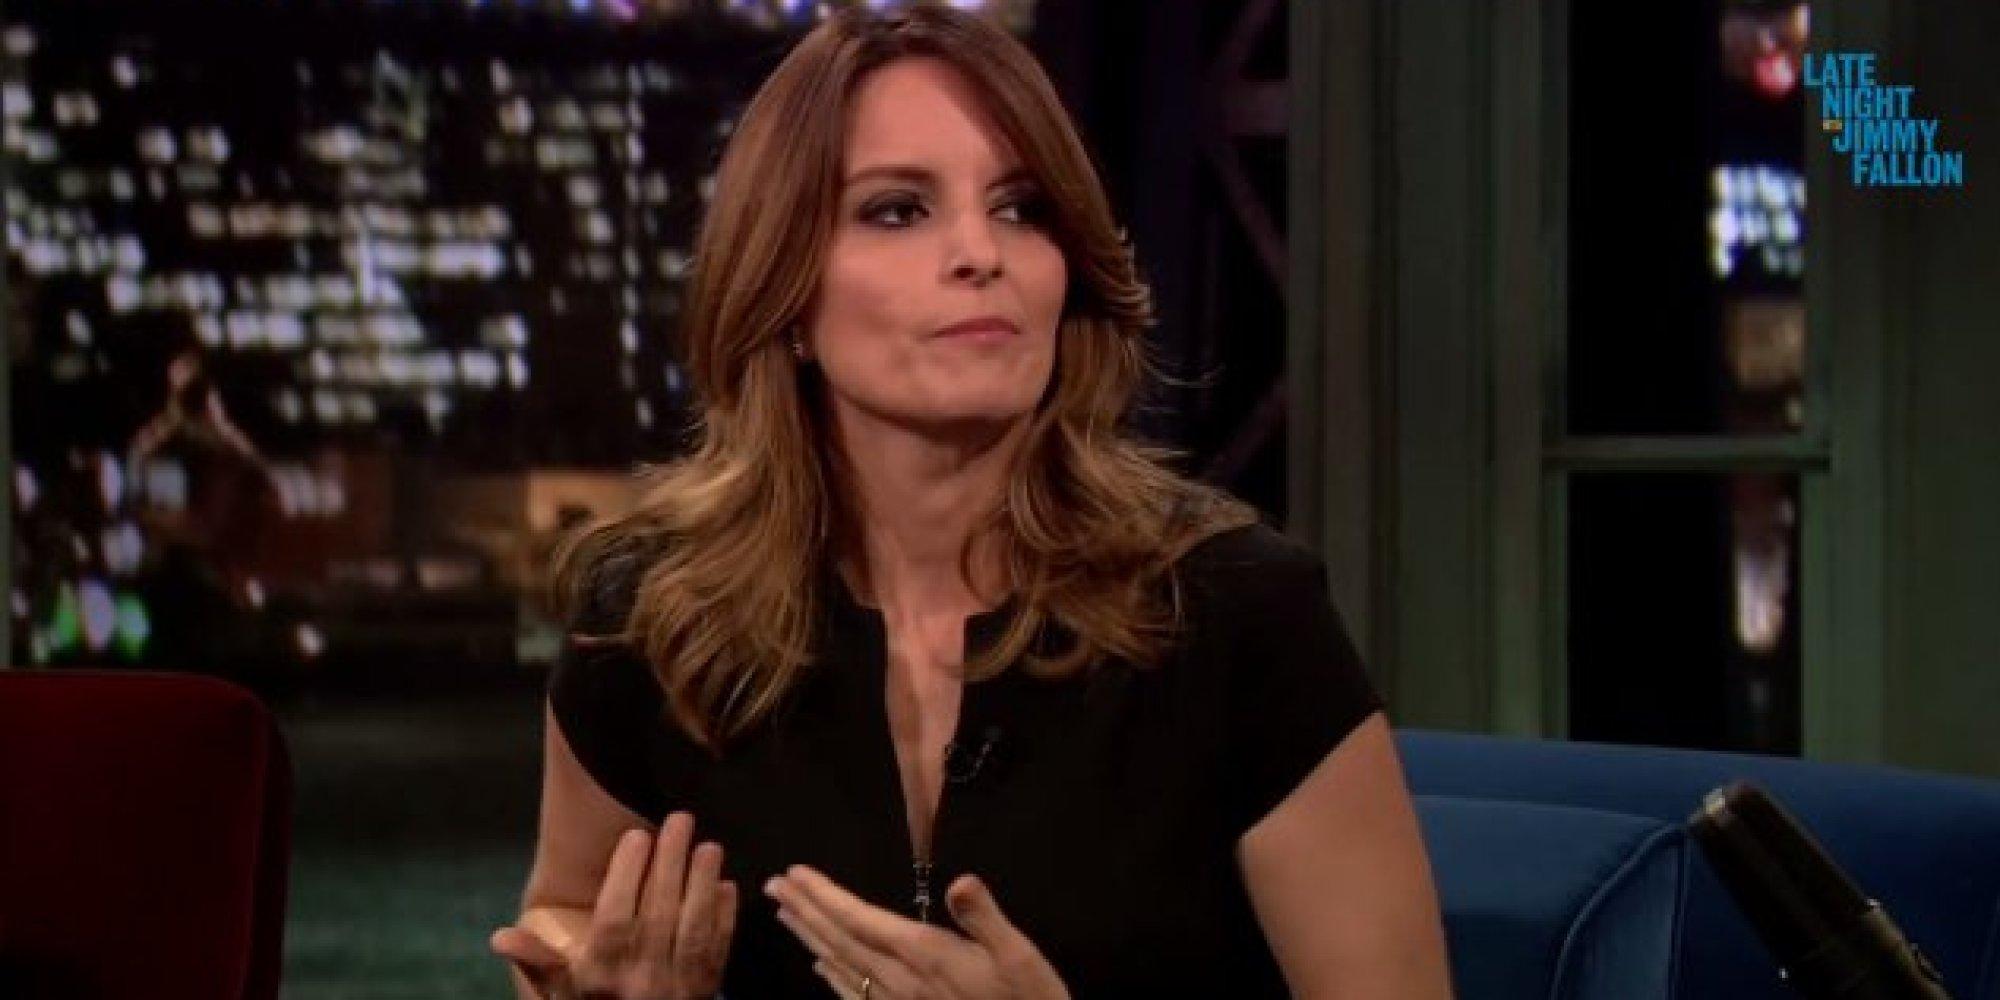 Tina Fey Shows Emmys Nip Slip In More Detail On 'Fallon ...